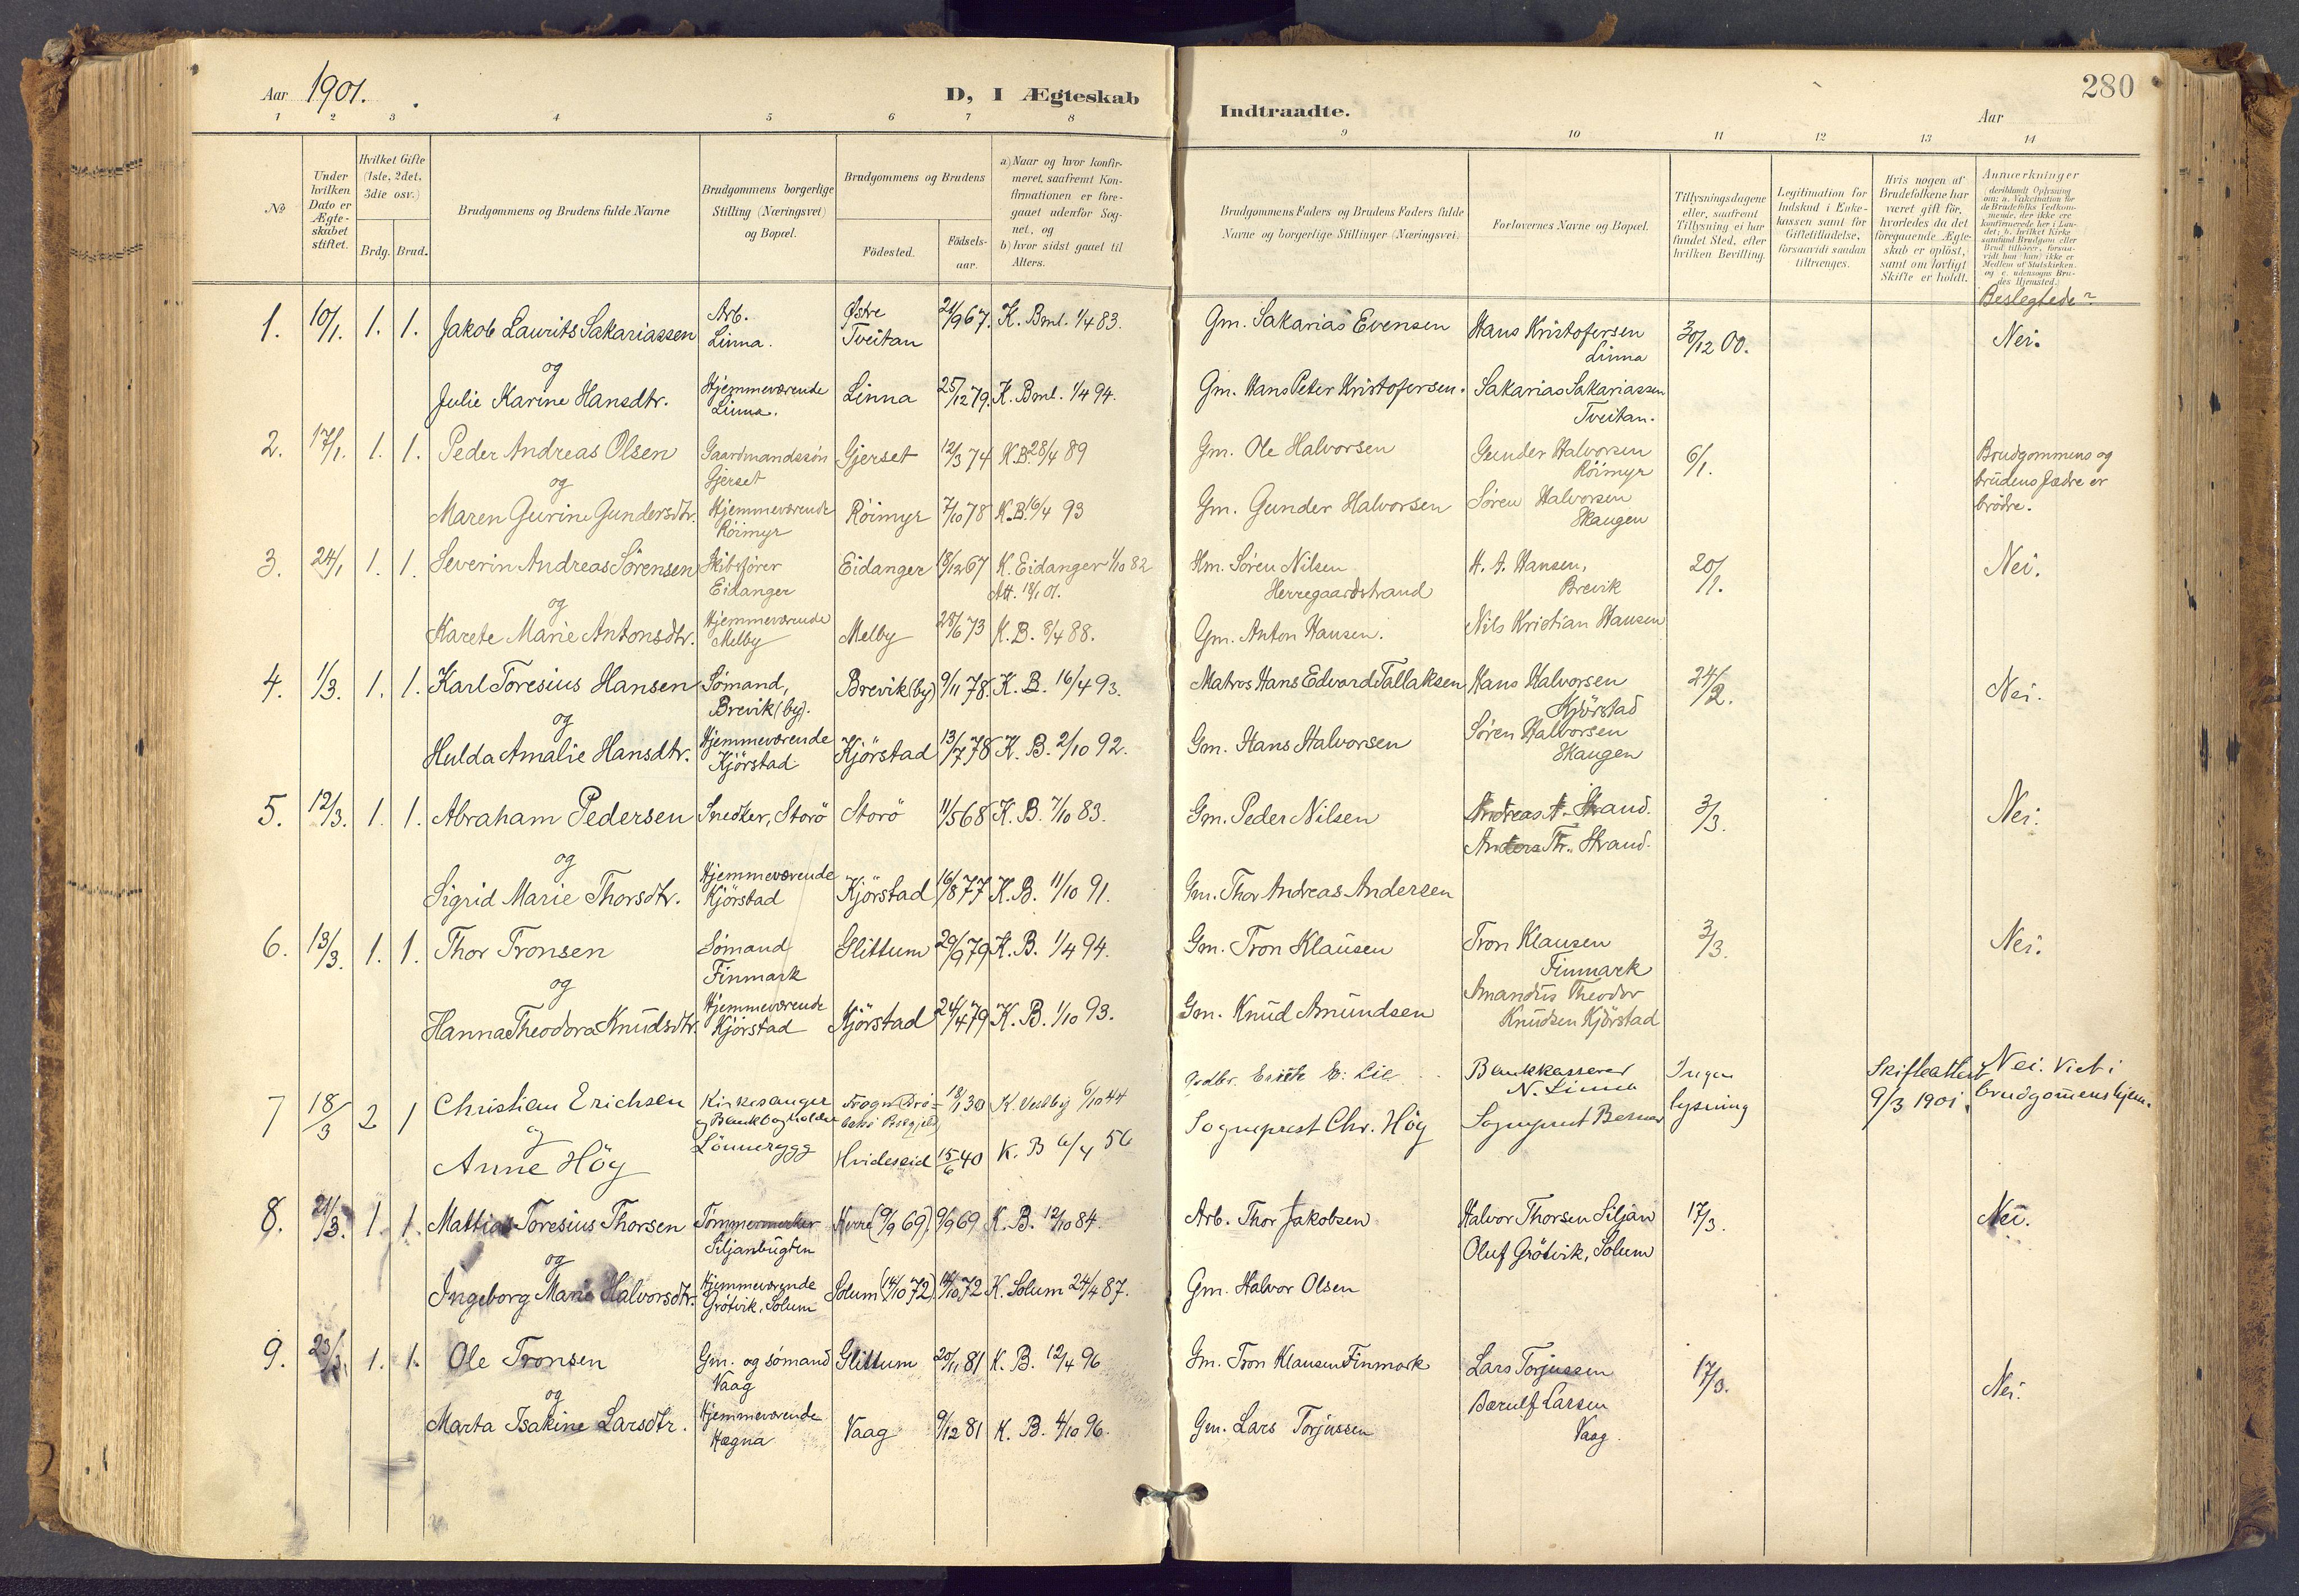 SAKO, Bamble kirkebøker, F/Fa/L0009: Ministerialbok nr. I 9, 1901-1917, s. 280